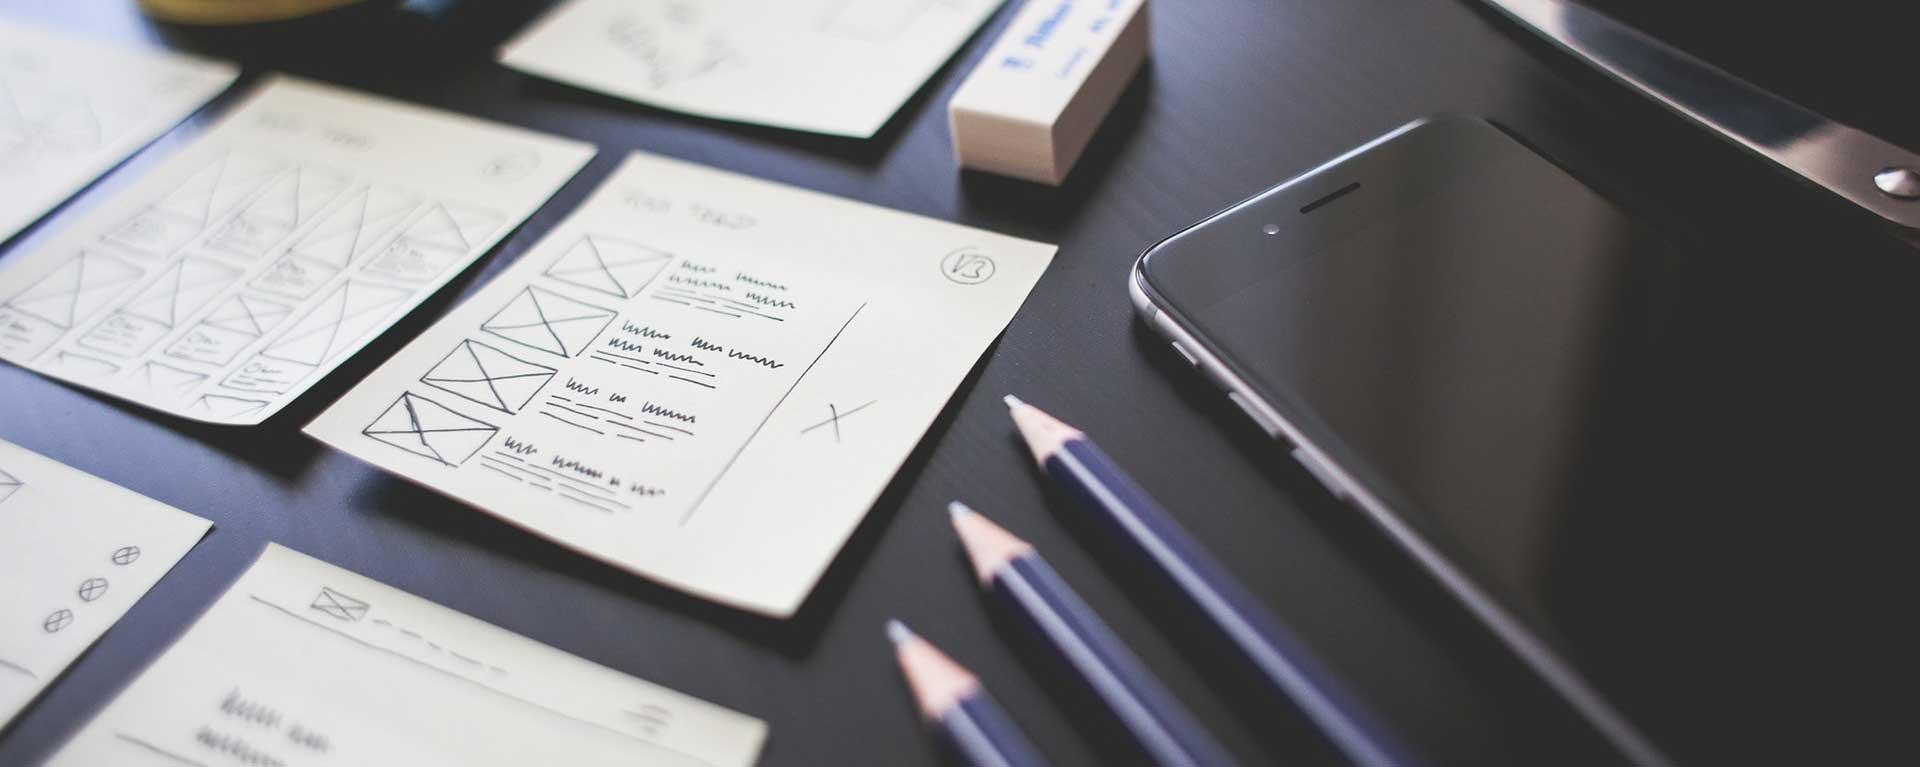 graphique-stylo